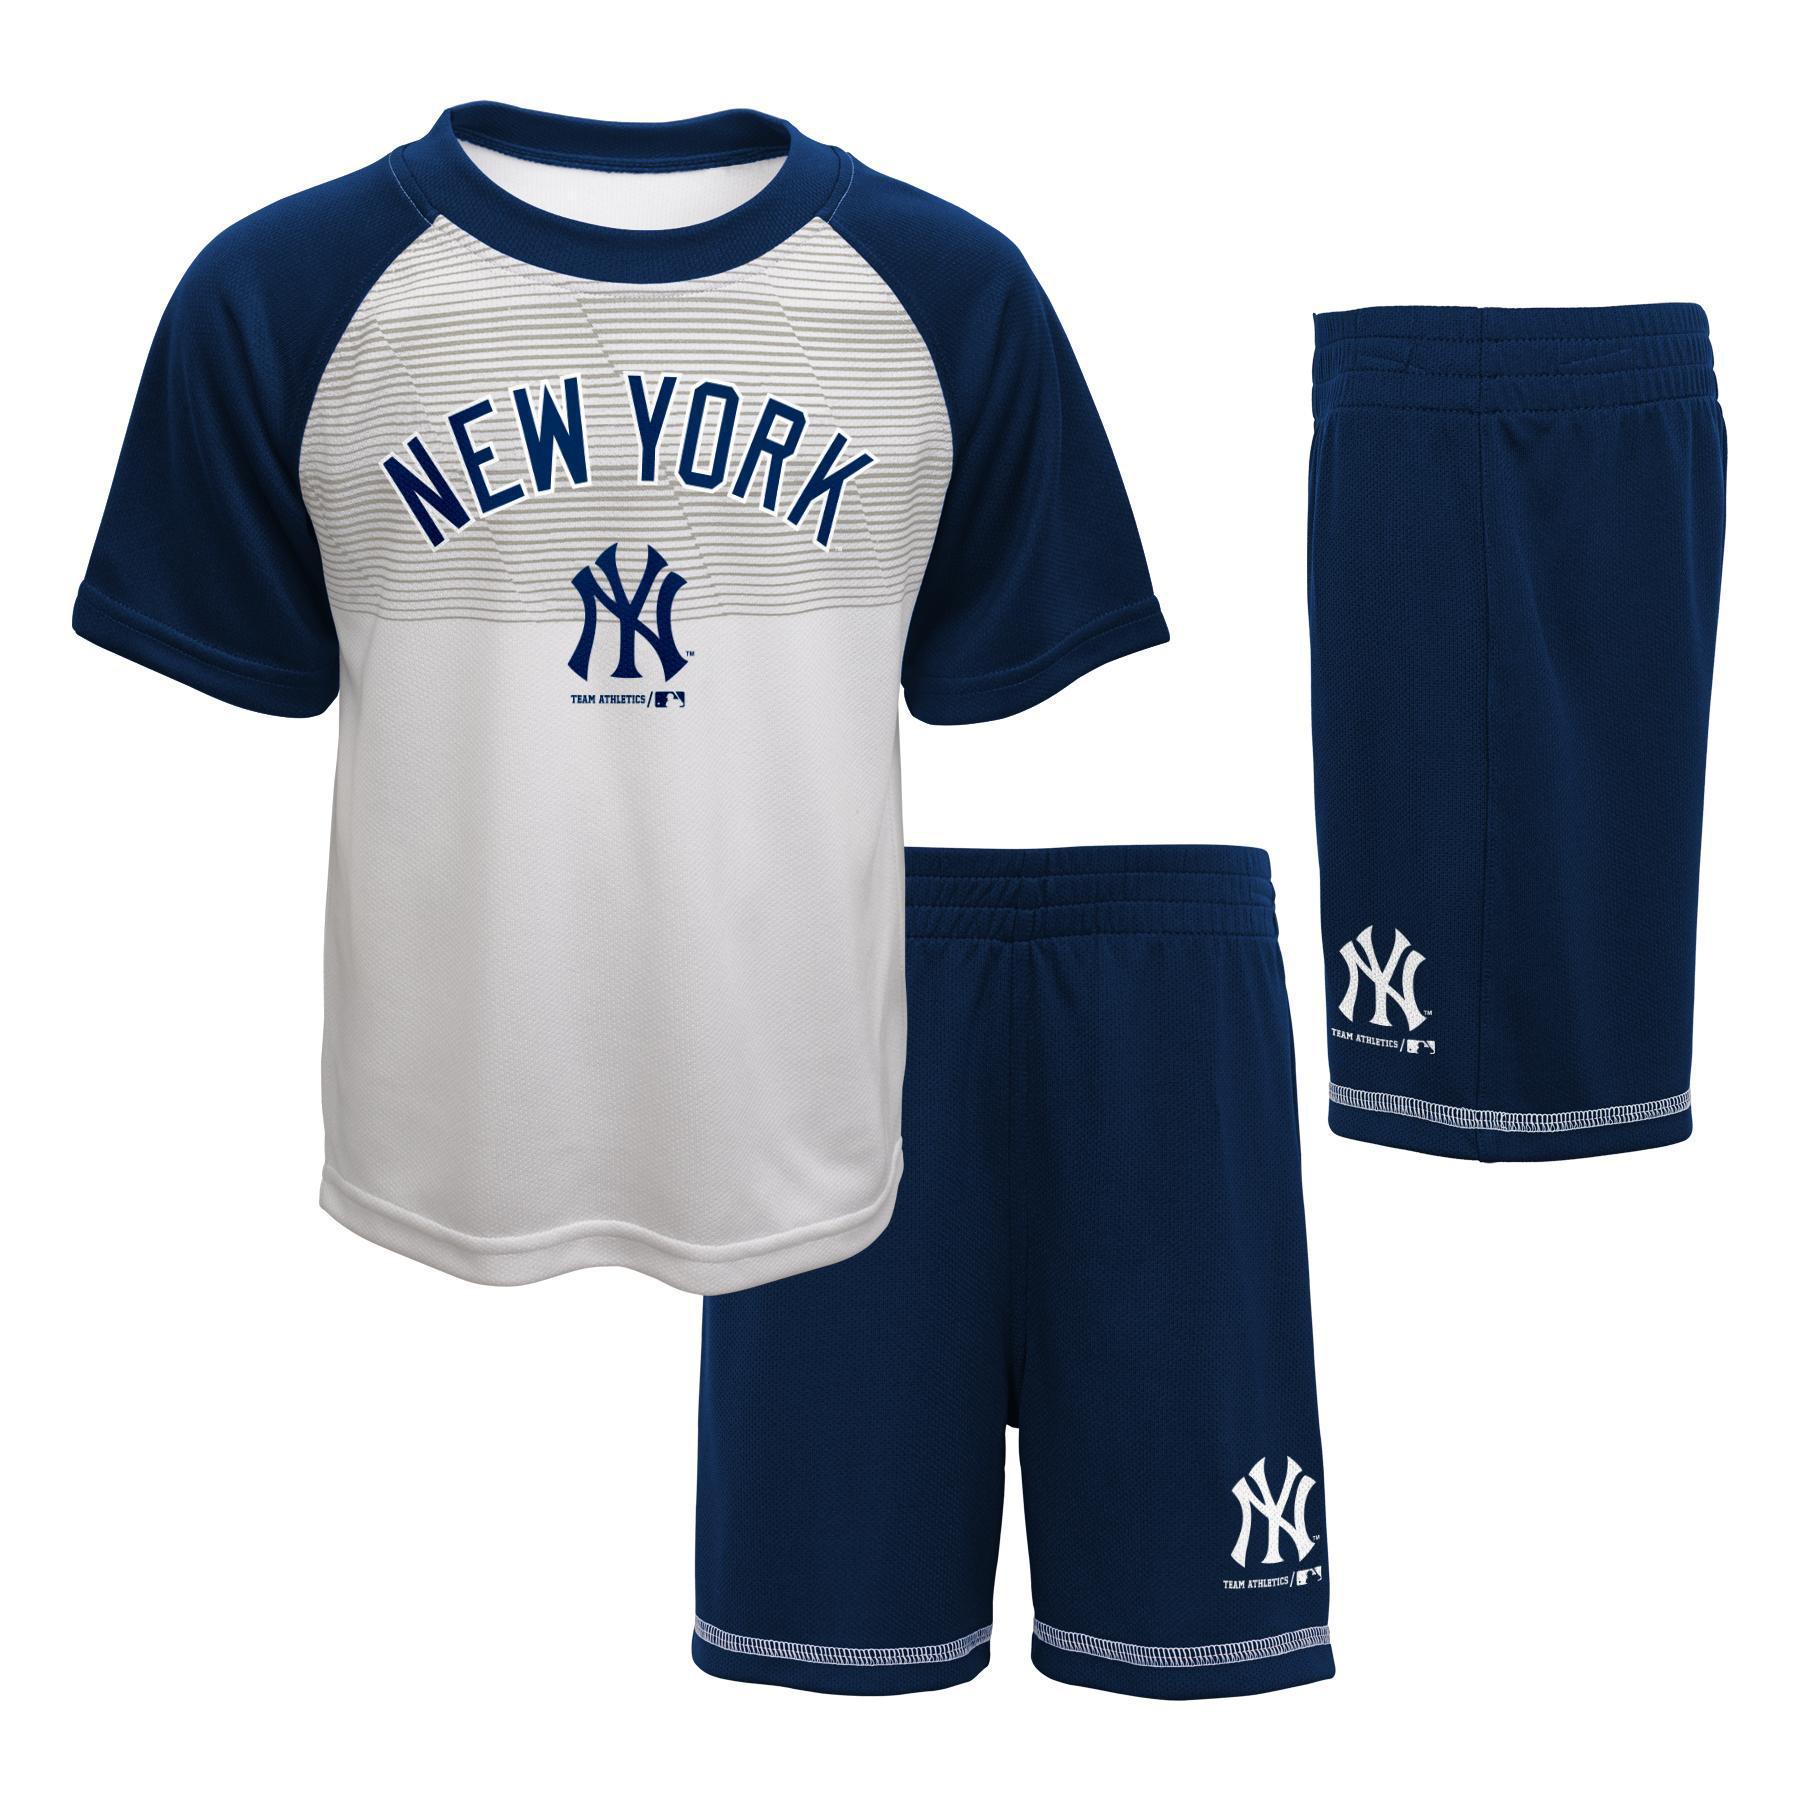 MLB Toddler Boys' T-Shirt & Shorts - New York Yankees, Size: 2T